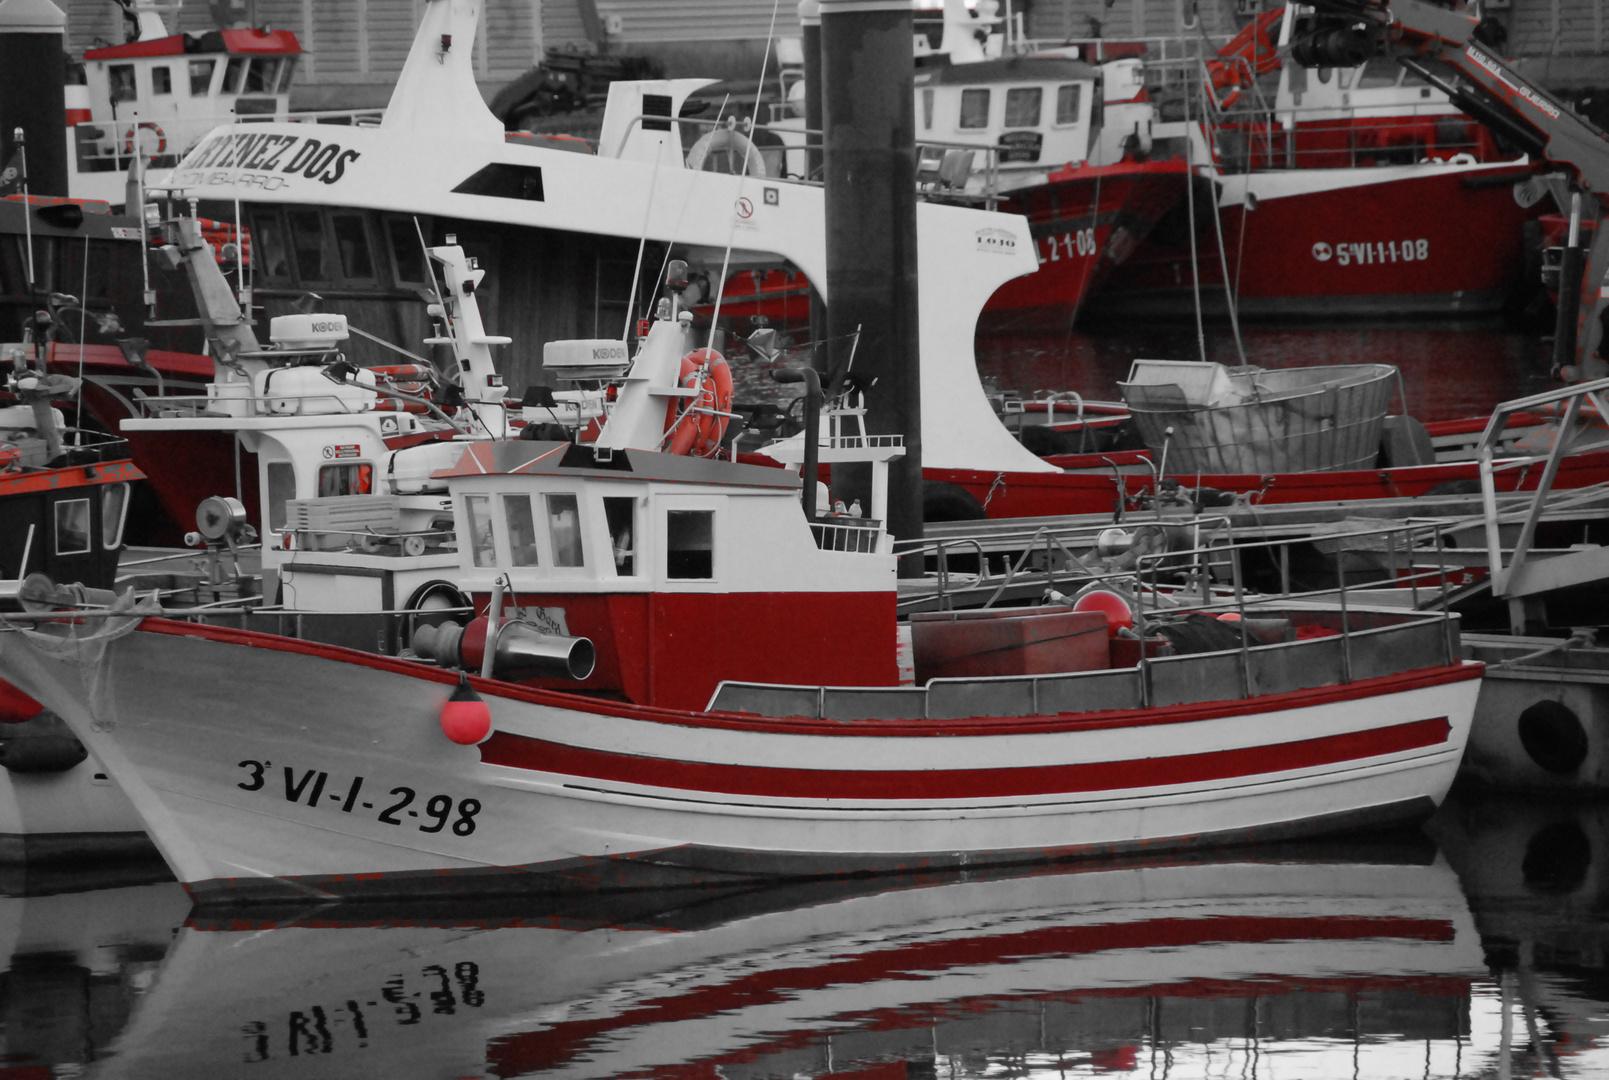 Barquitros de Combarro